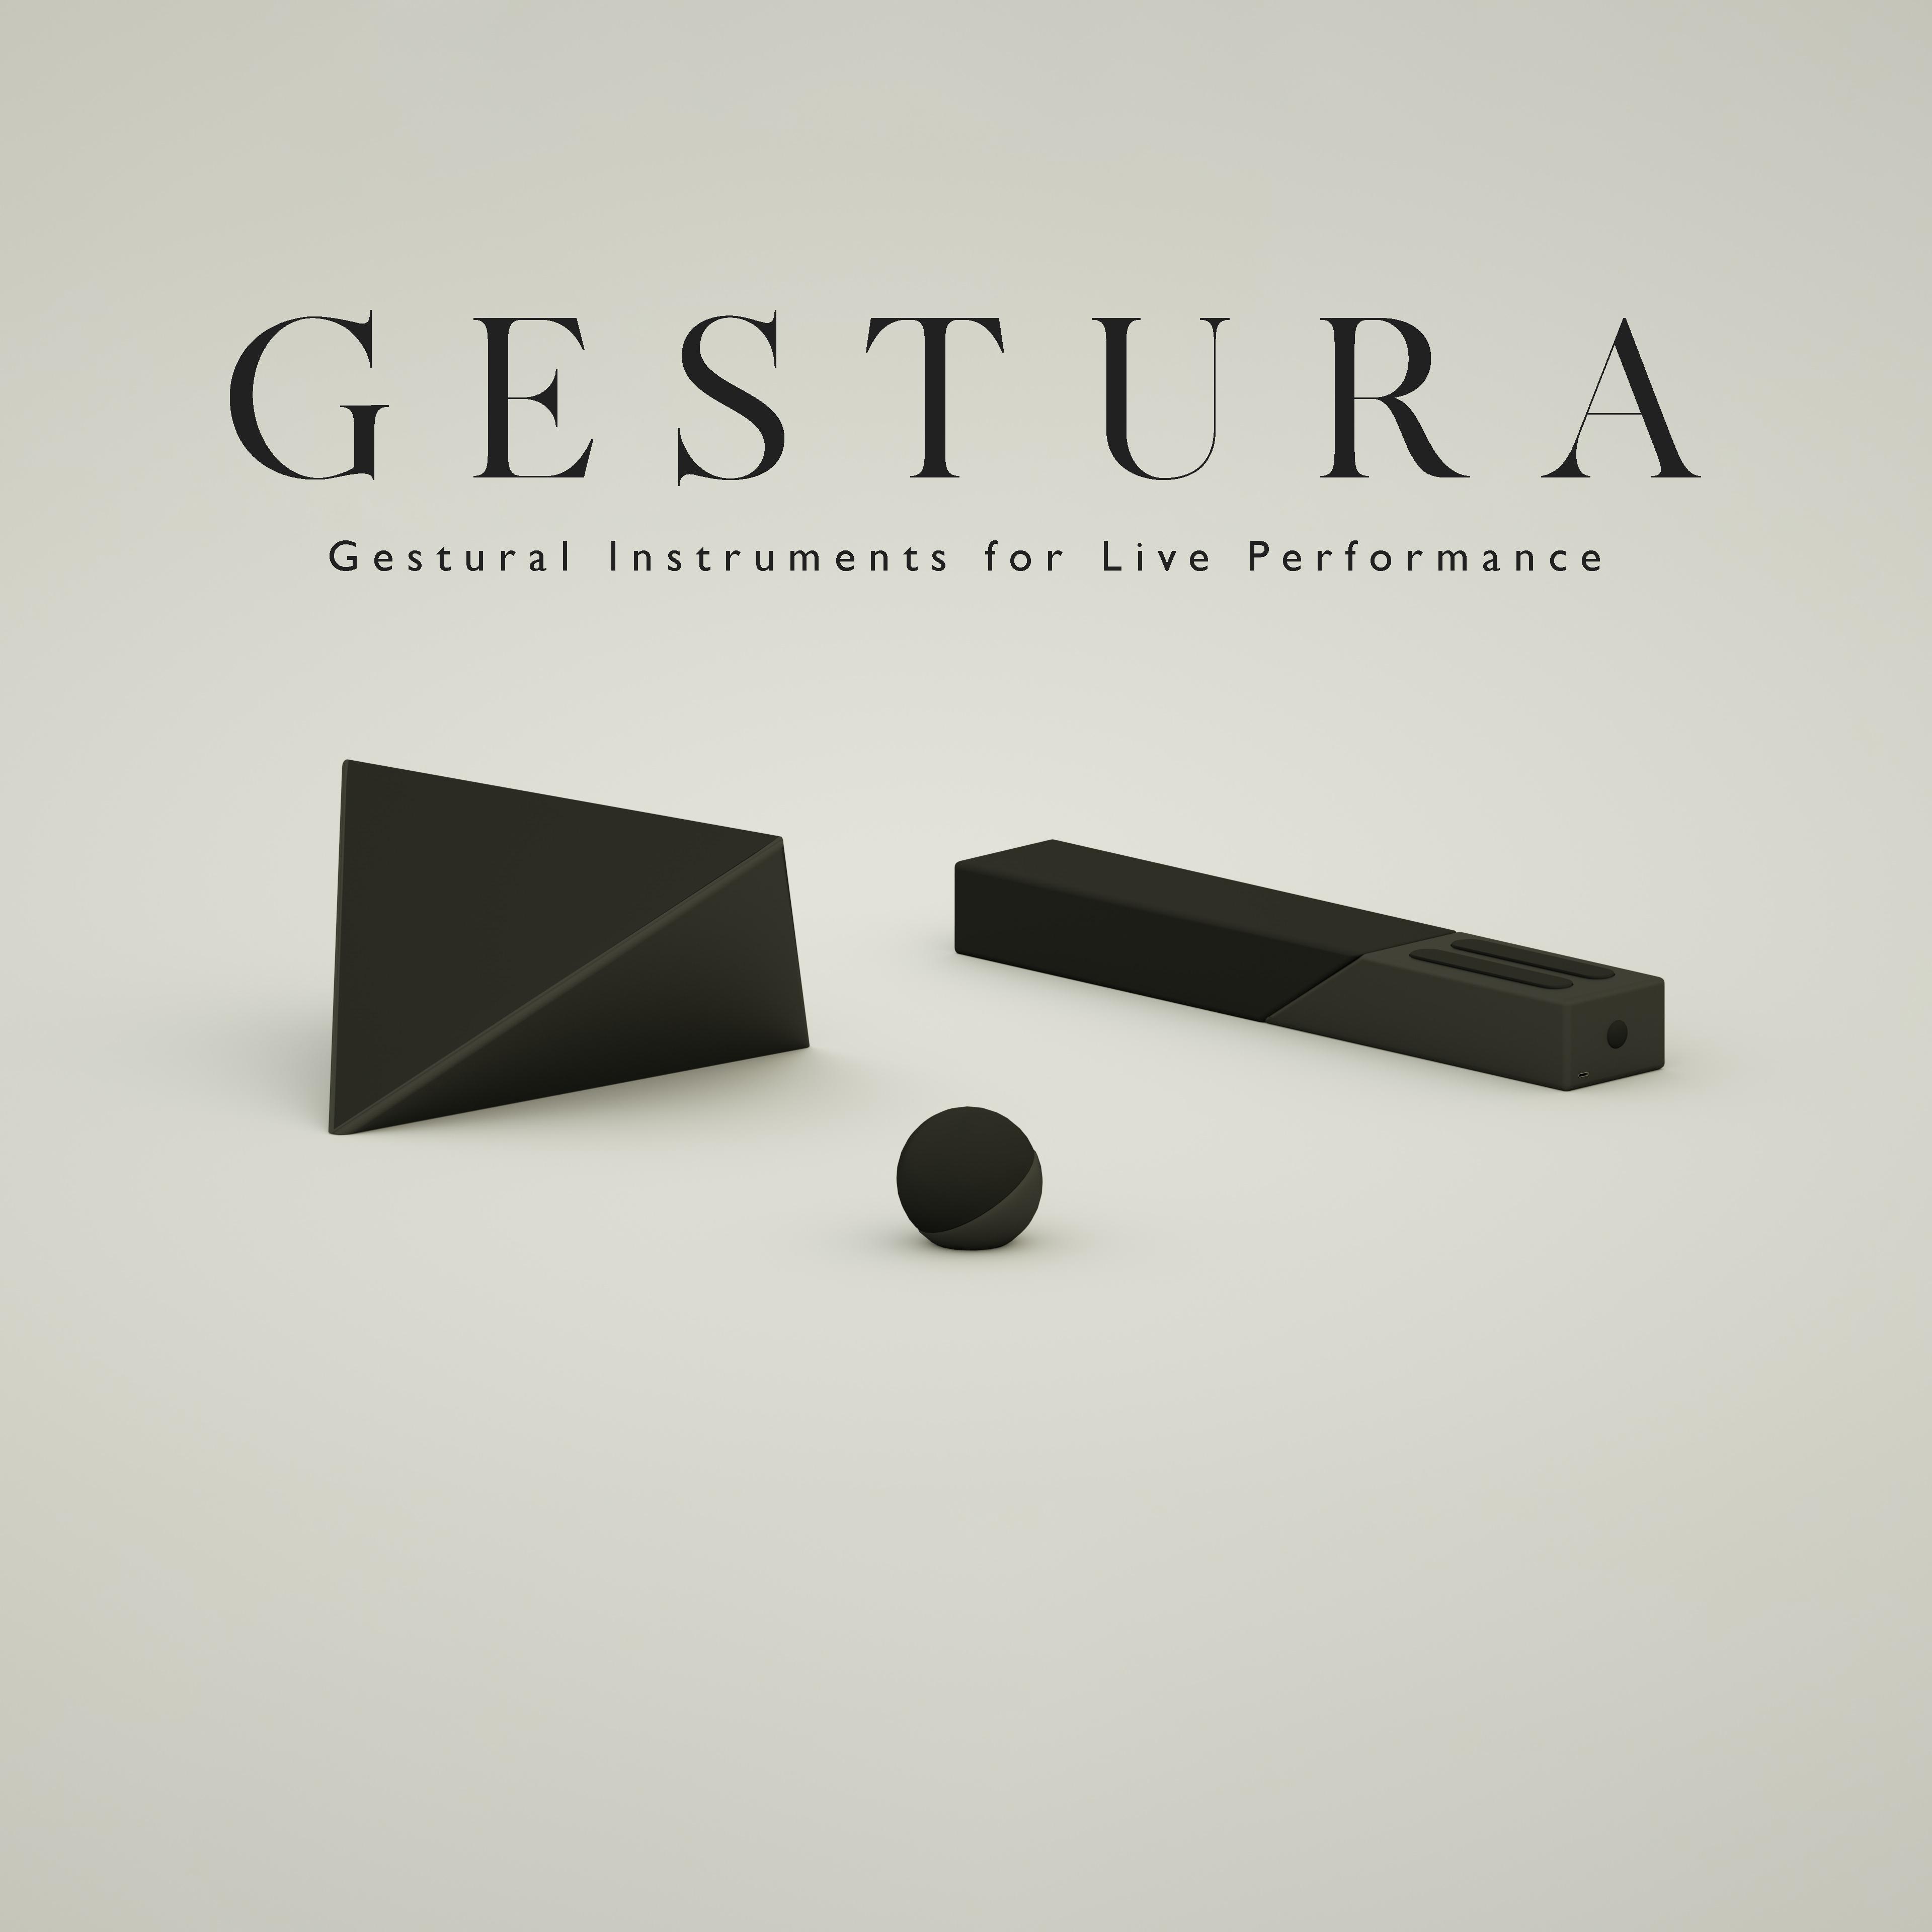 3 Dark, geometric instruments